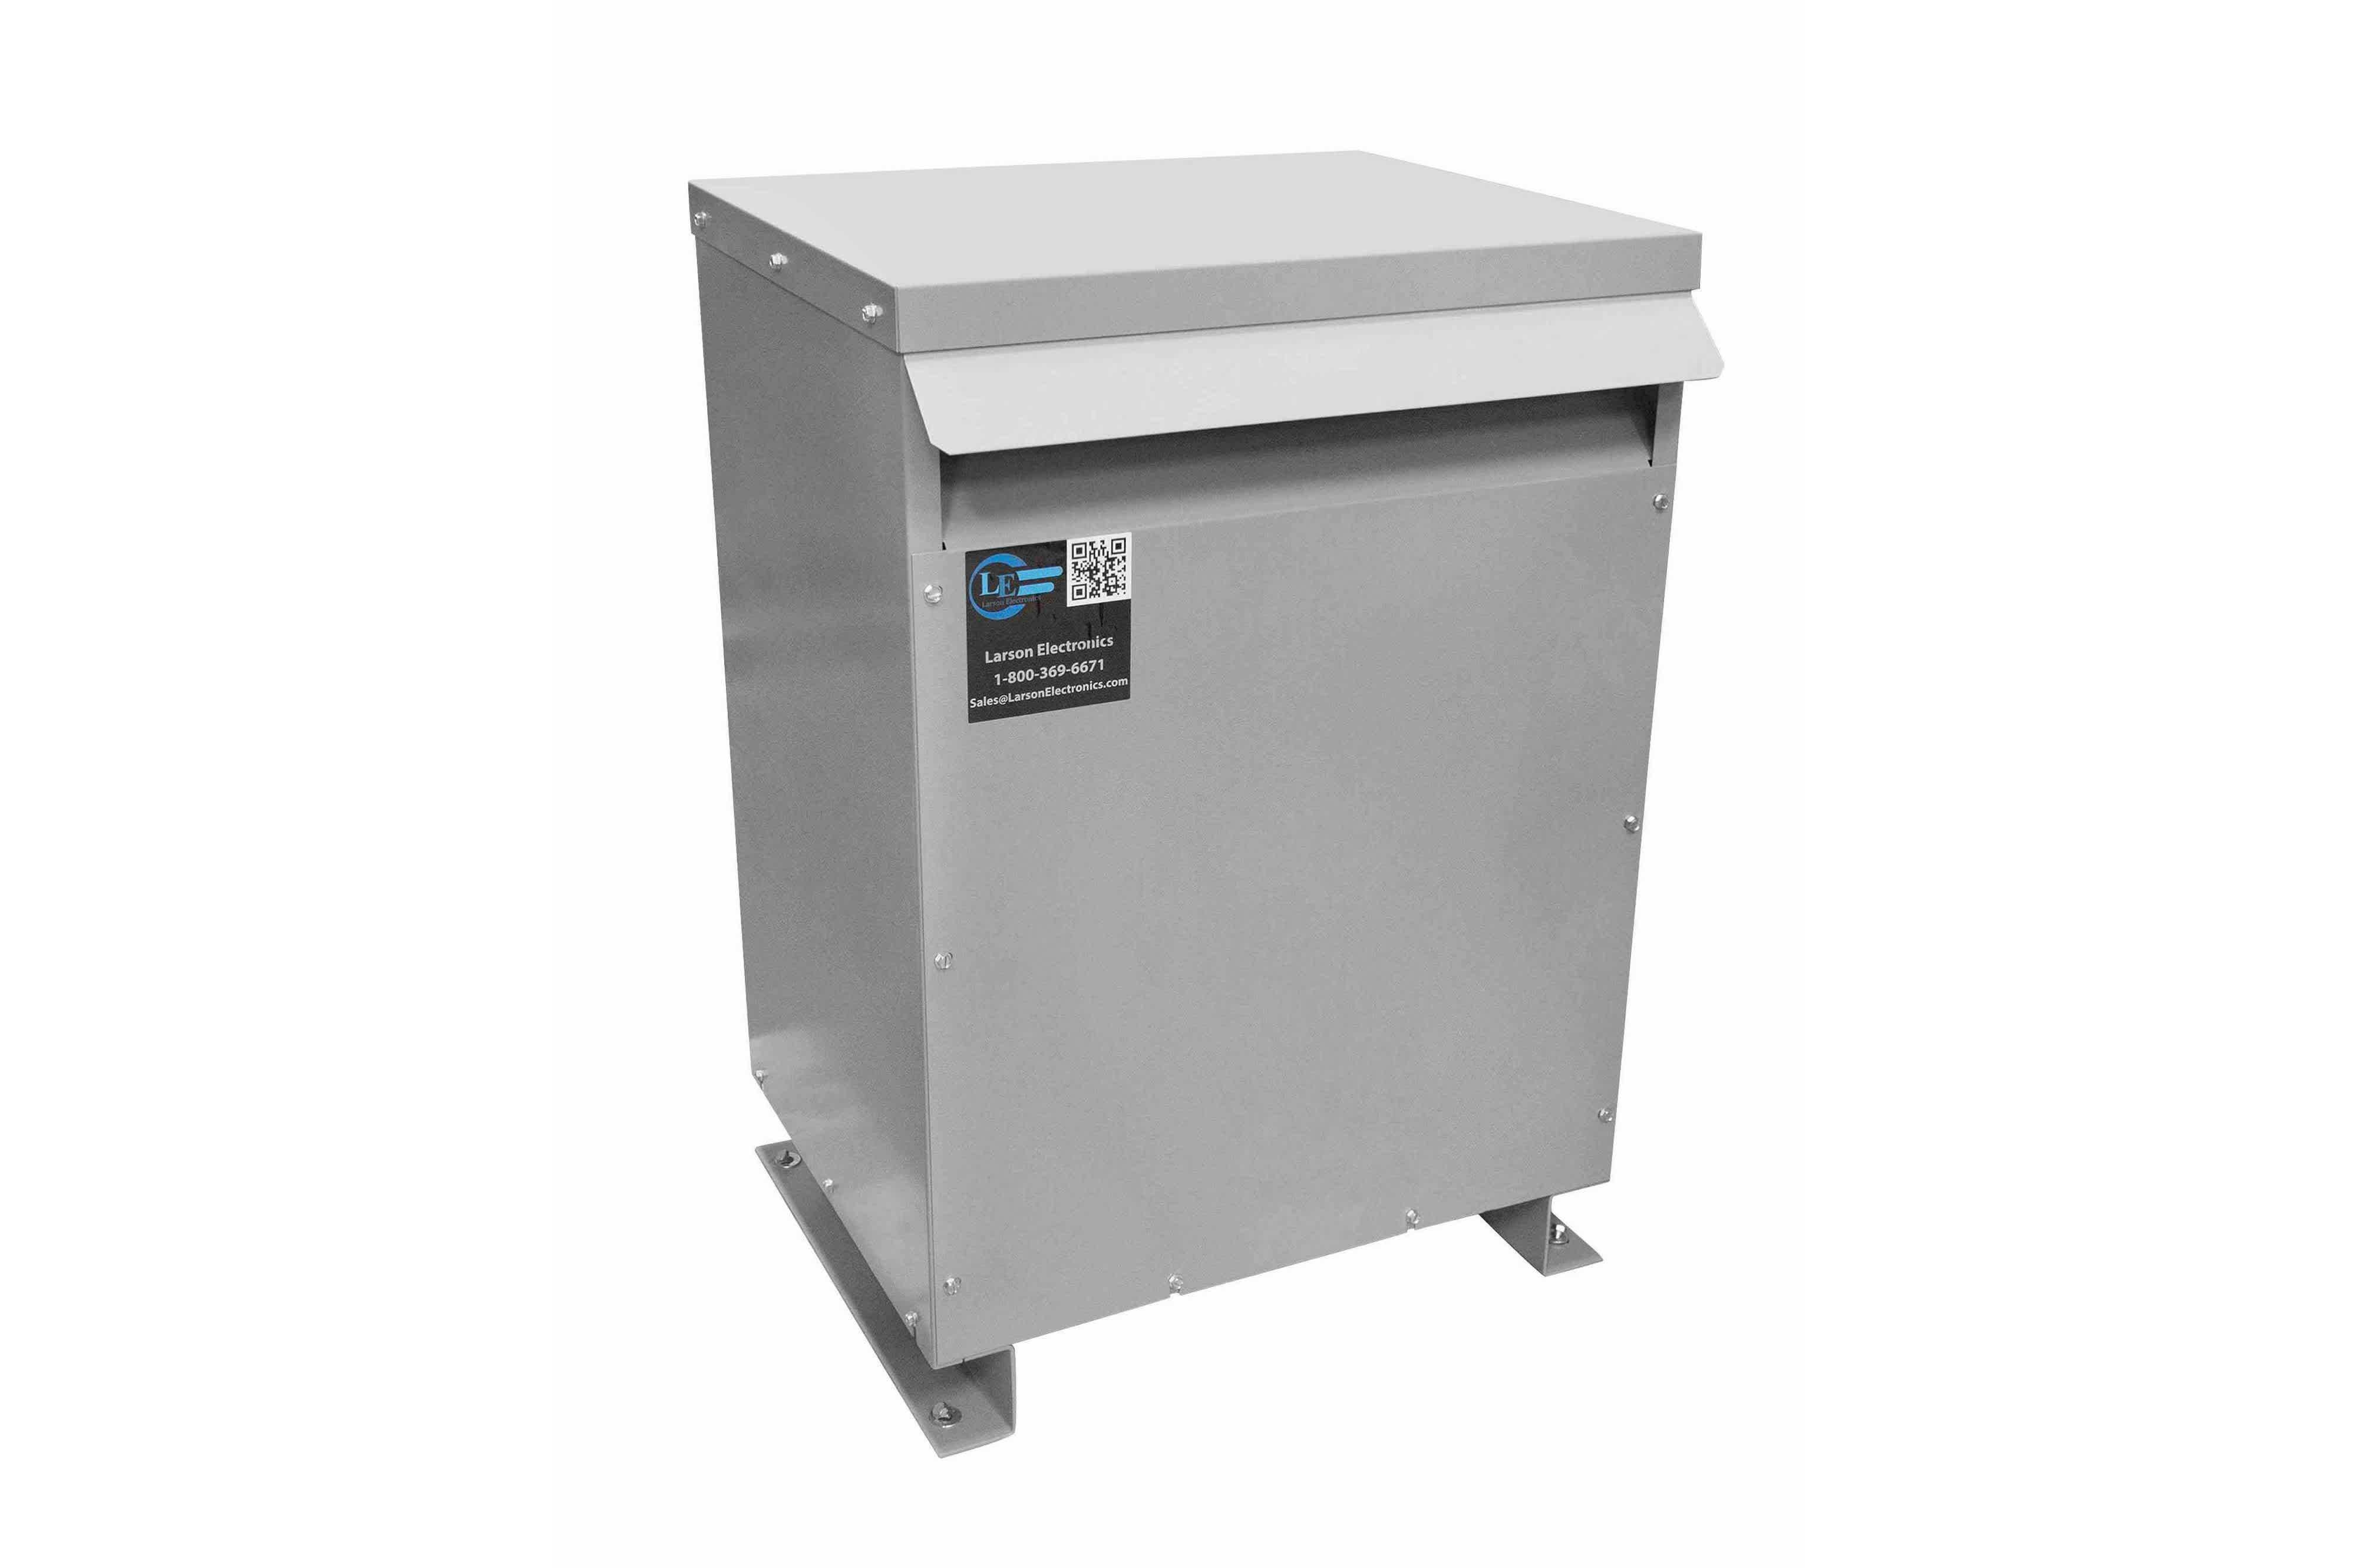 80 kVA 3PH DOE Transformer, 240V Delta Primary, 480Y/277 Wye-N Secondary, N3R, Ventilated, 60 Hz